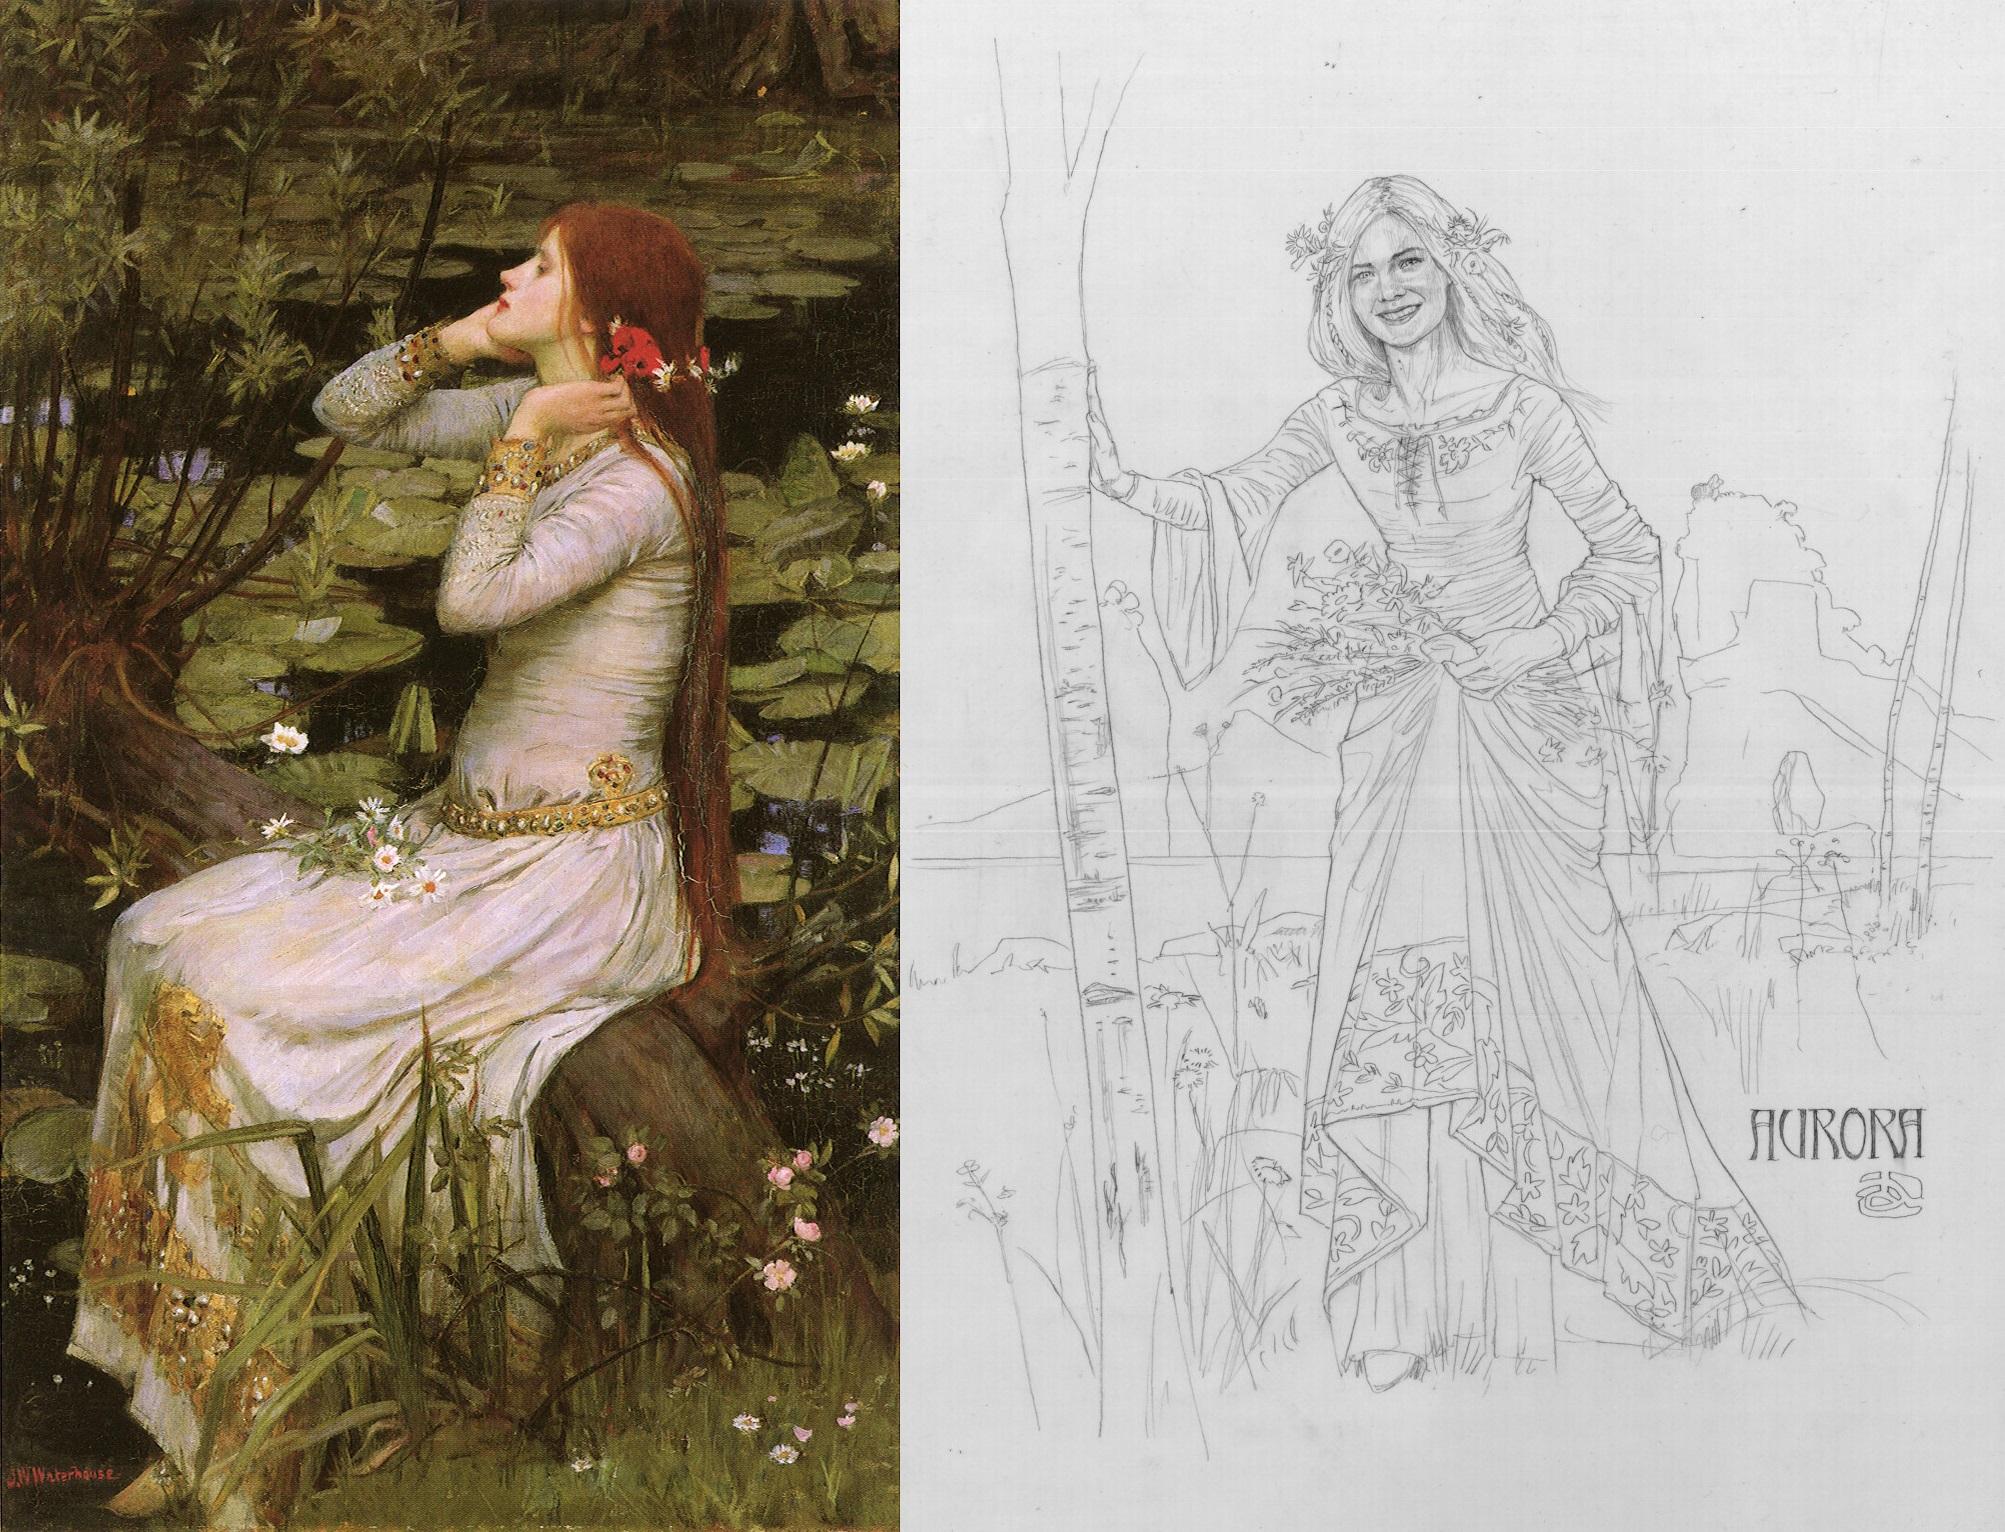 À esquerda: Ophelia (1894), de John William Waterhouse; à direita: croqui de traje de Aurora.